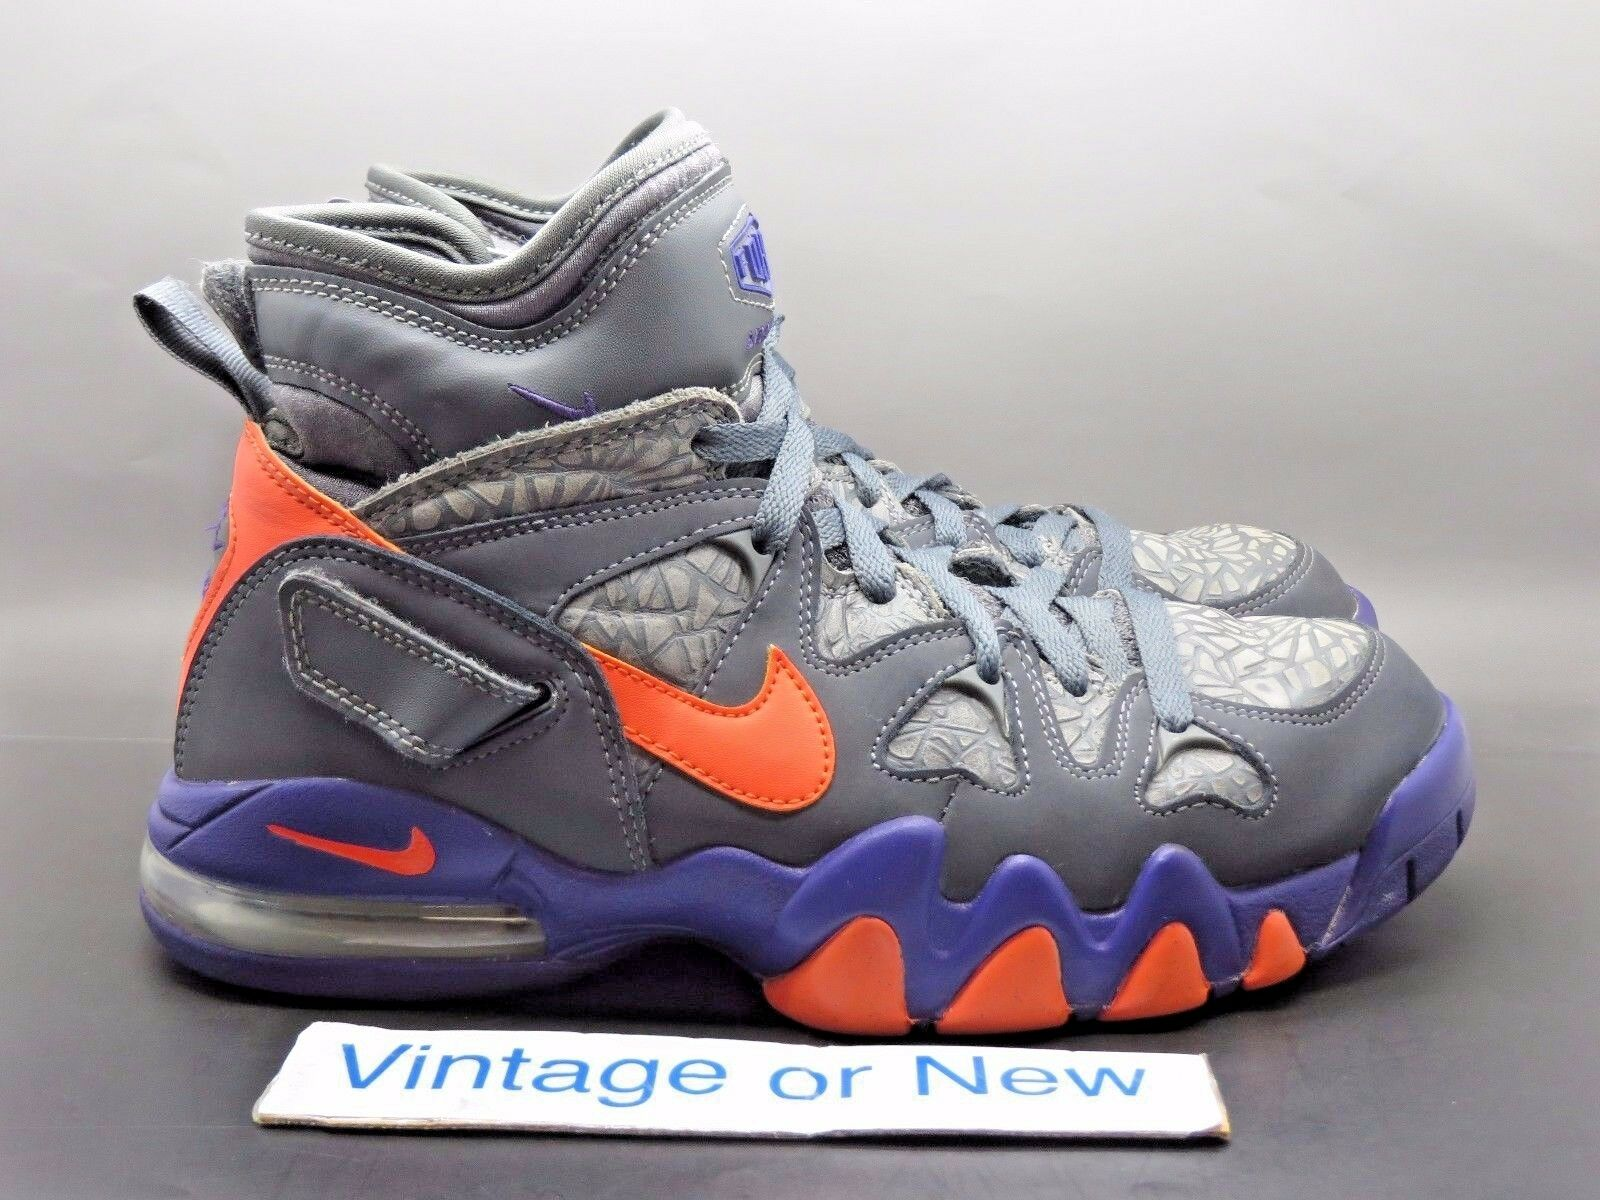 Nike Air Max Strong II 2 Phoenix Suns 2013 sz 8